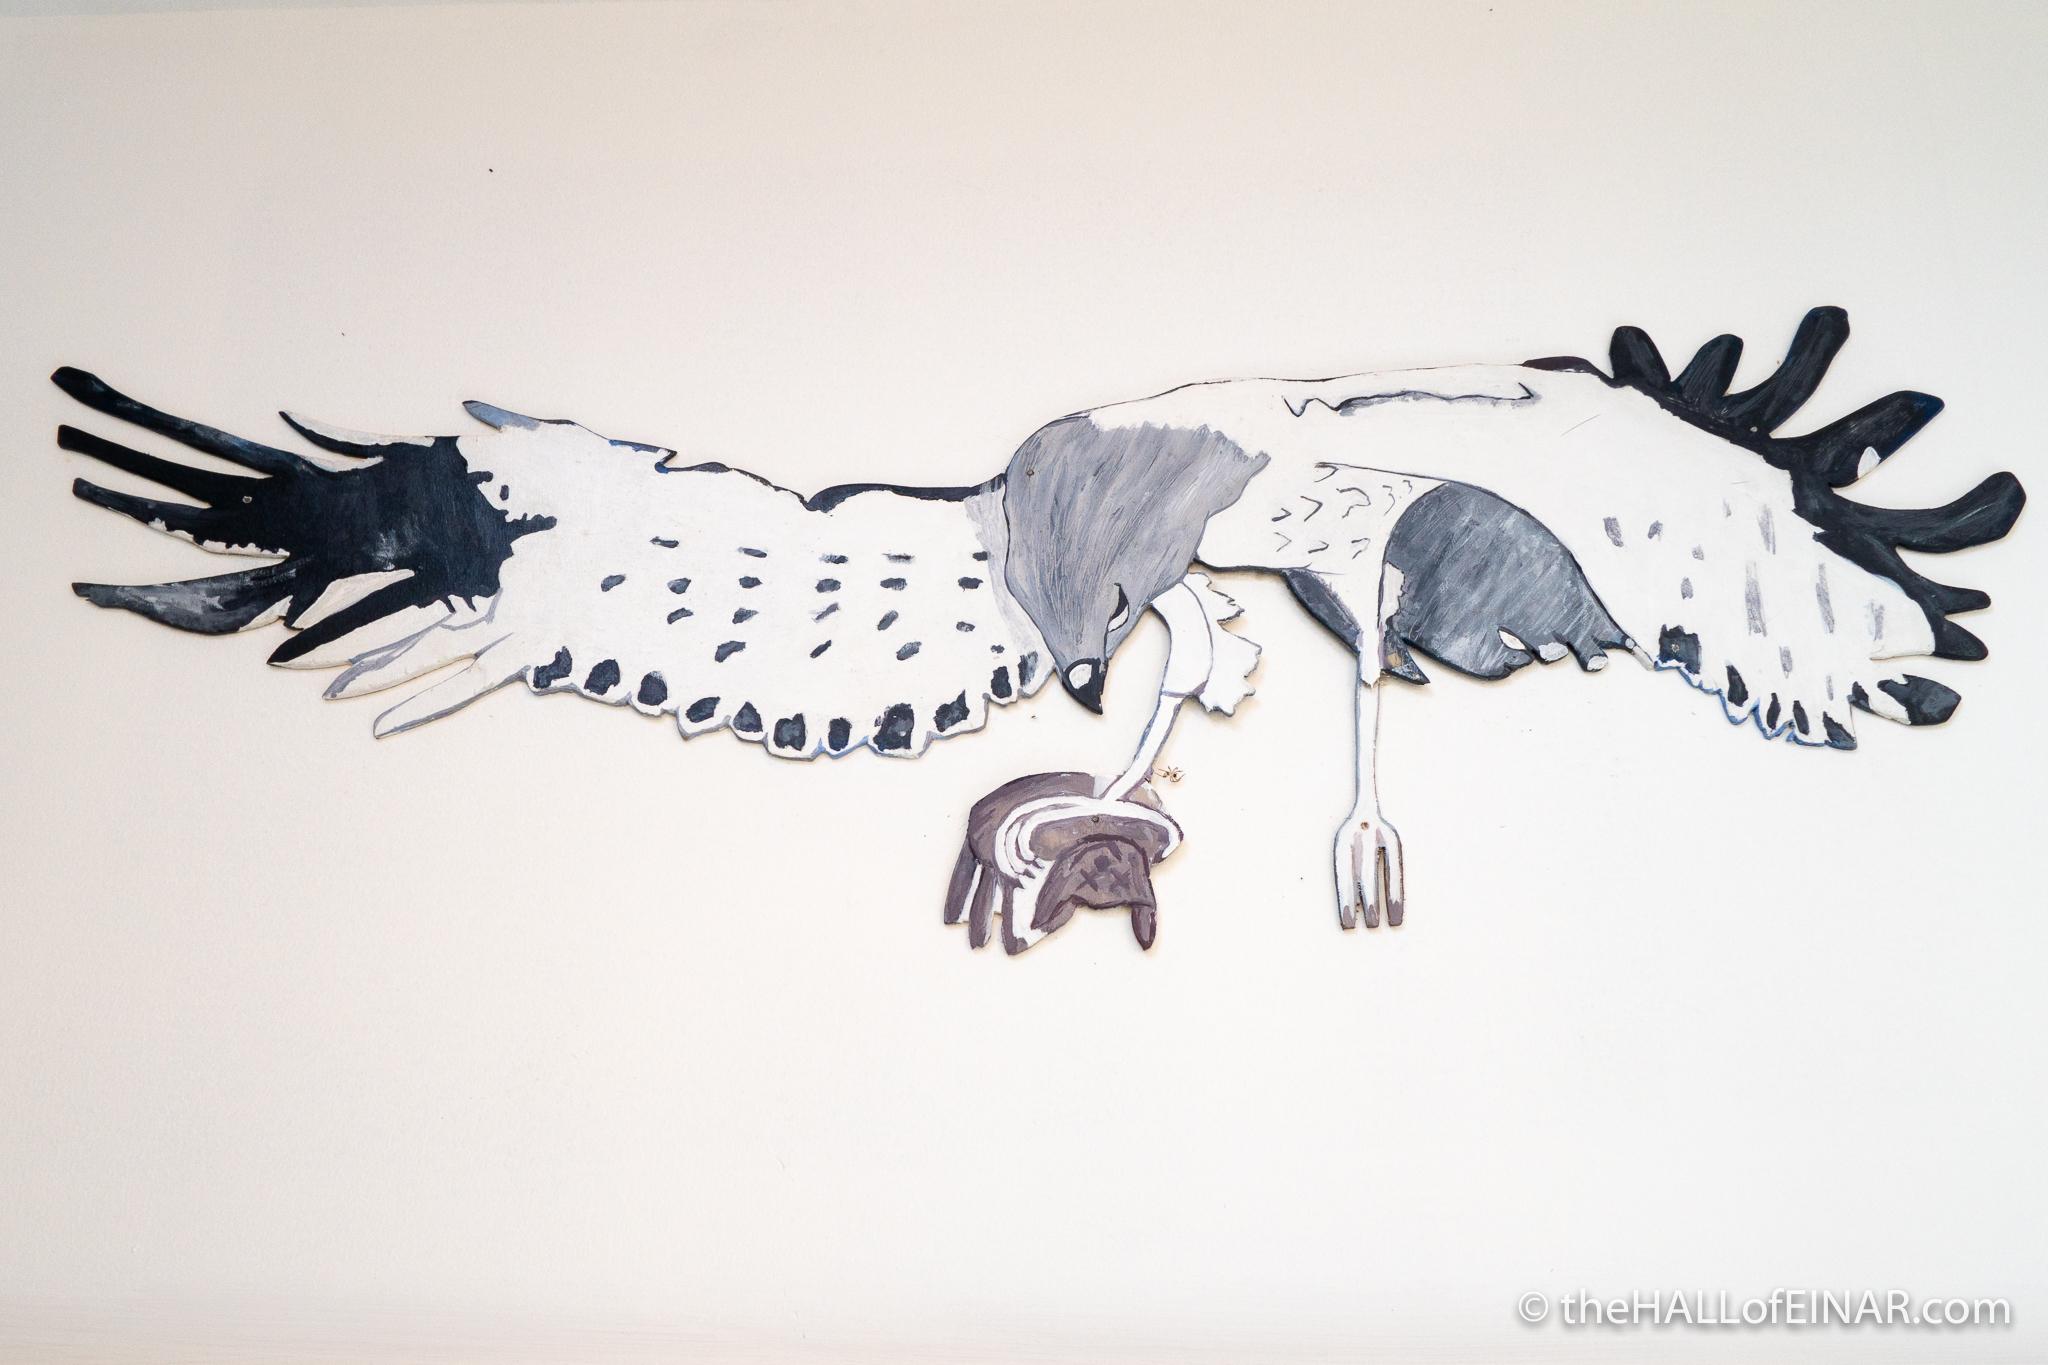 Hen Harrier - The Hall of Einar - Artwork by Firth Primary School